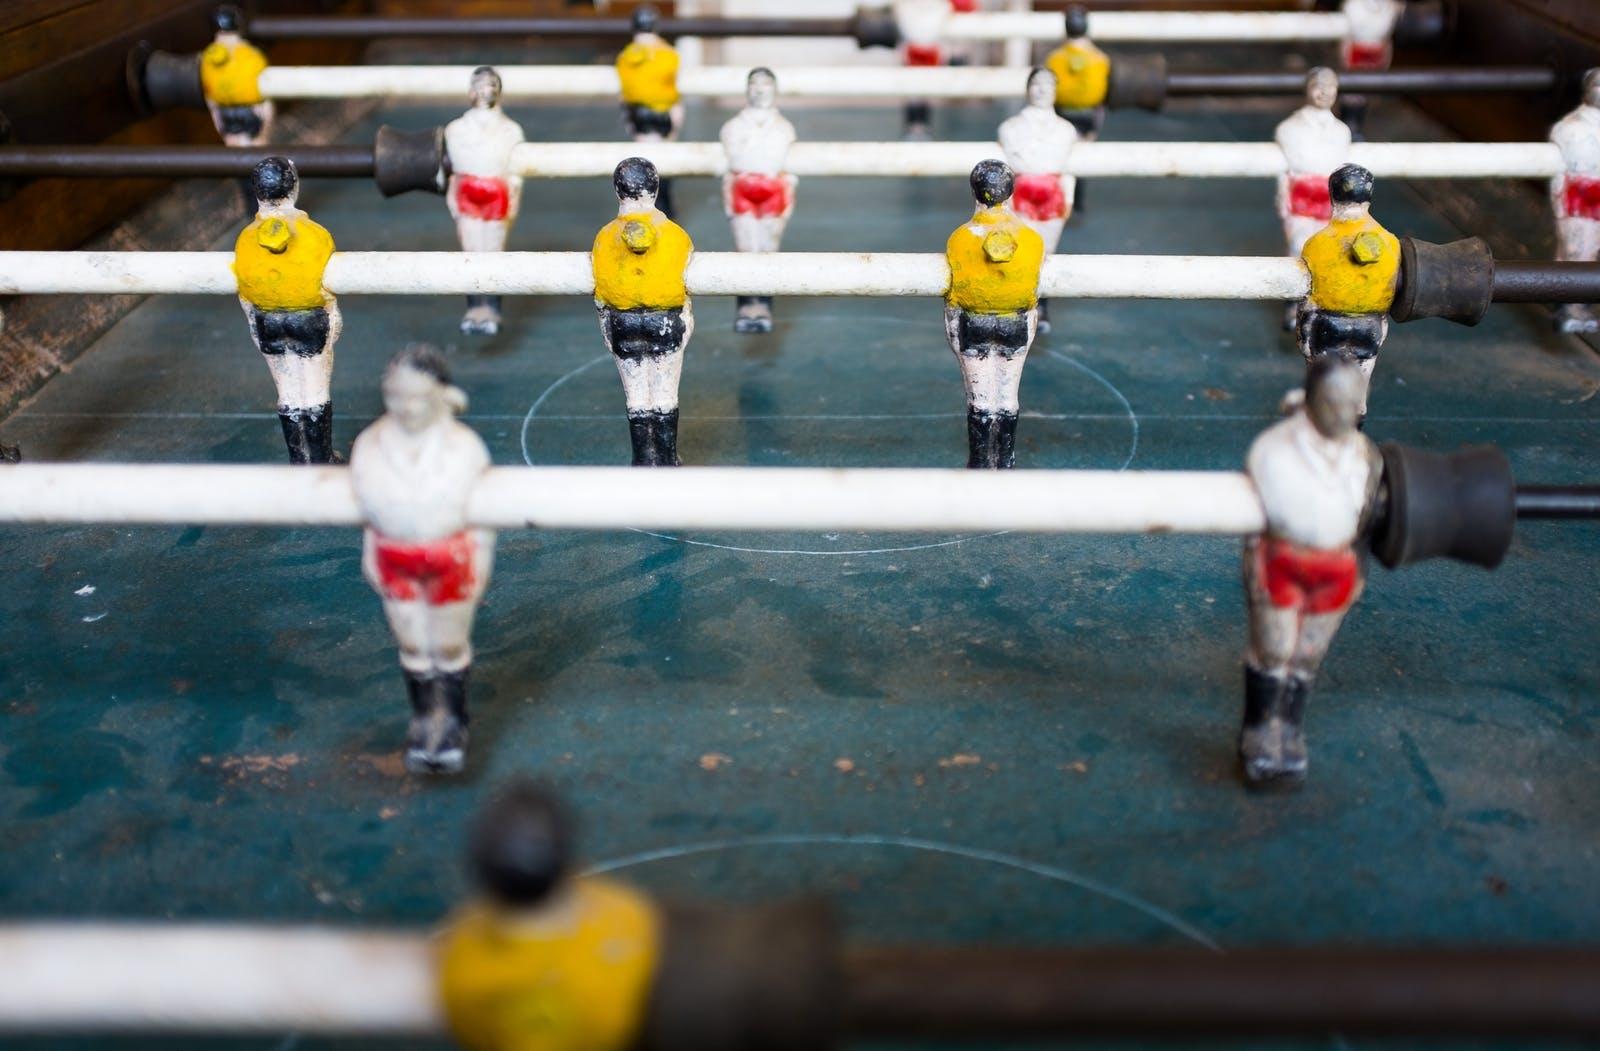 osservare concorrenza per definire target clienti